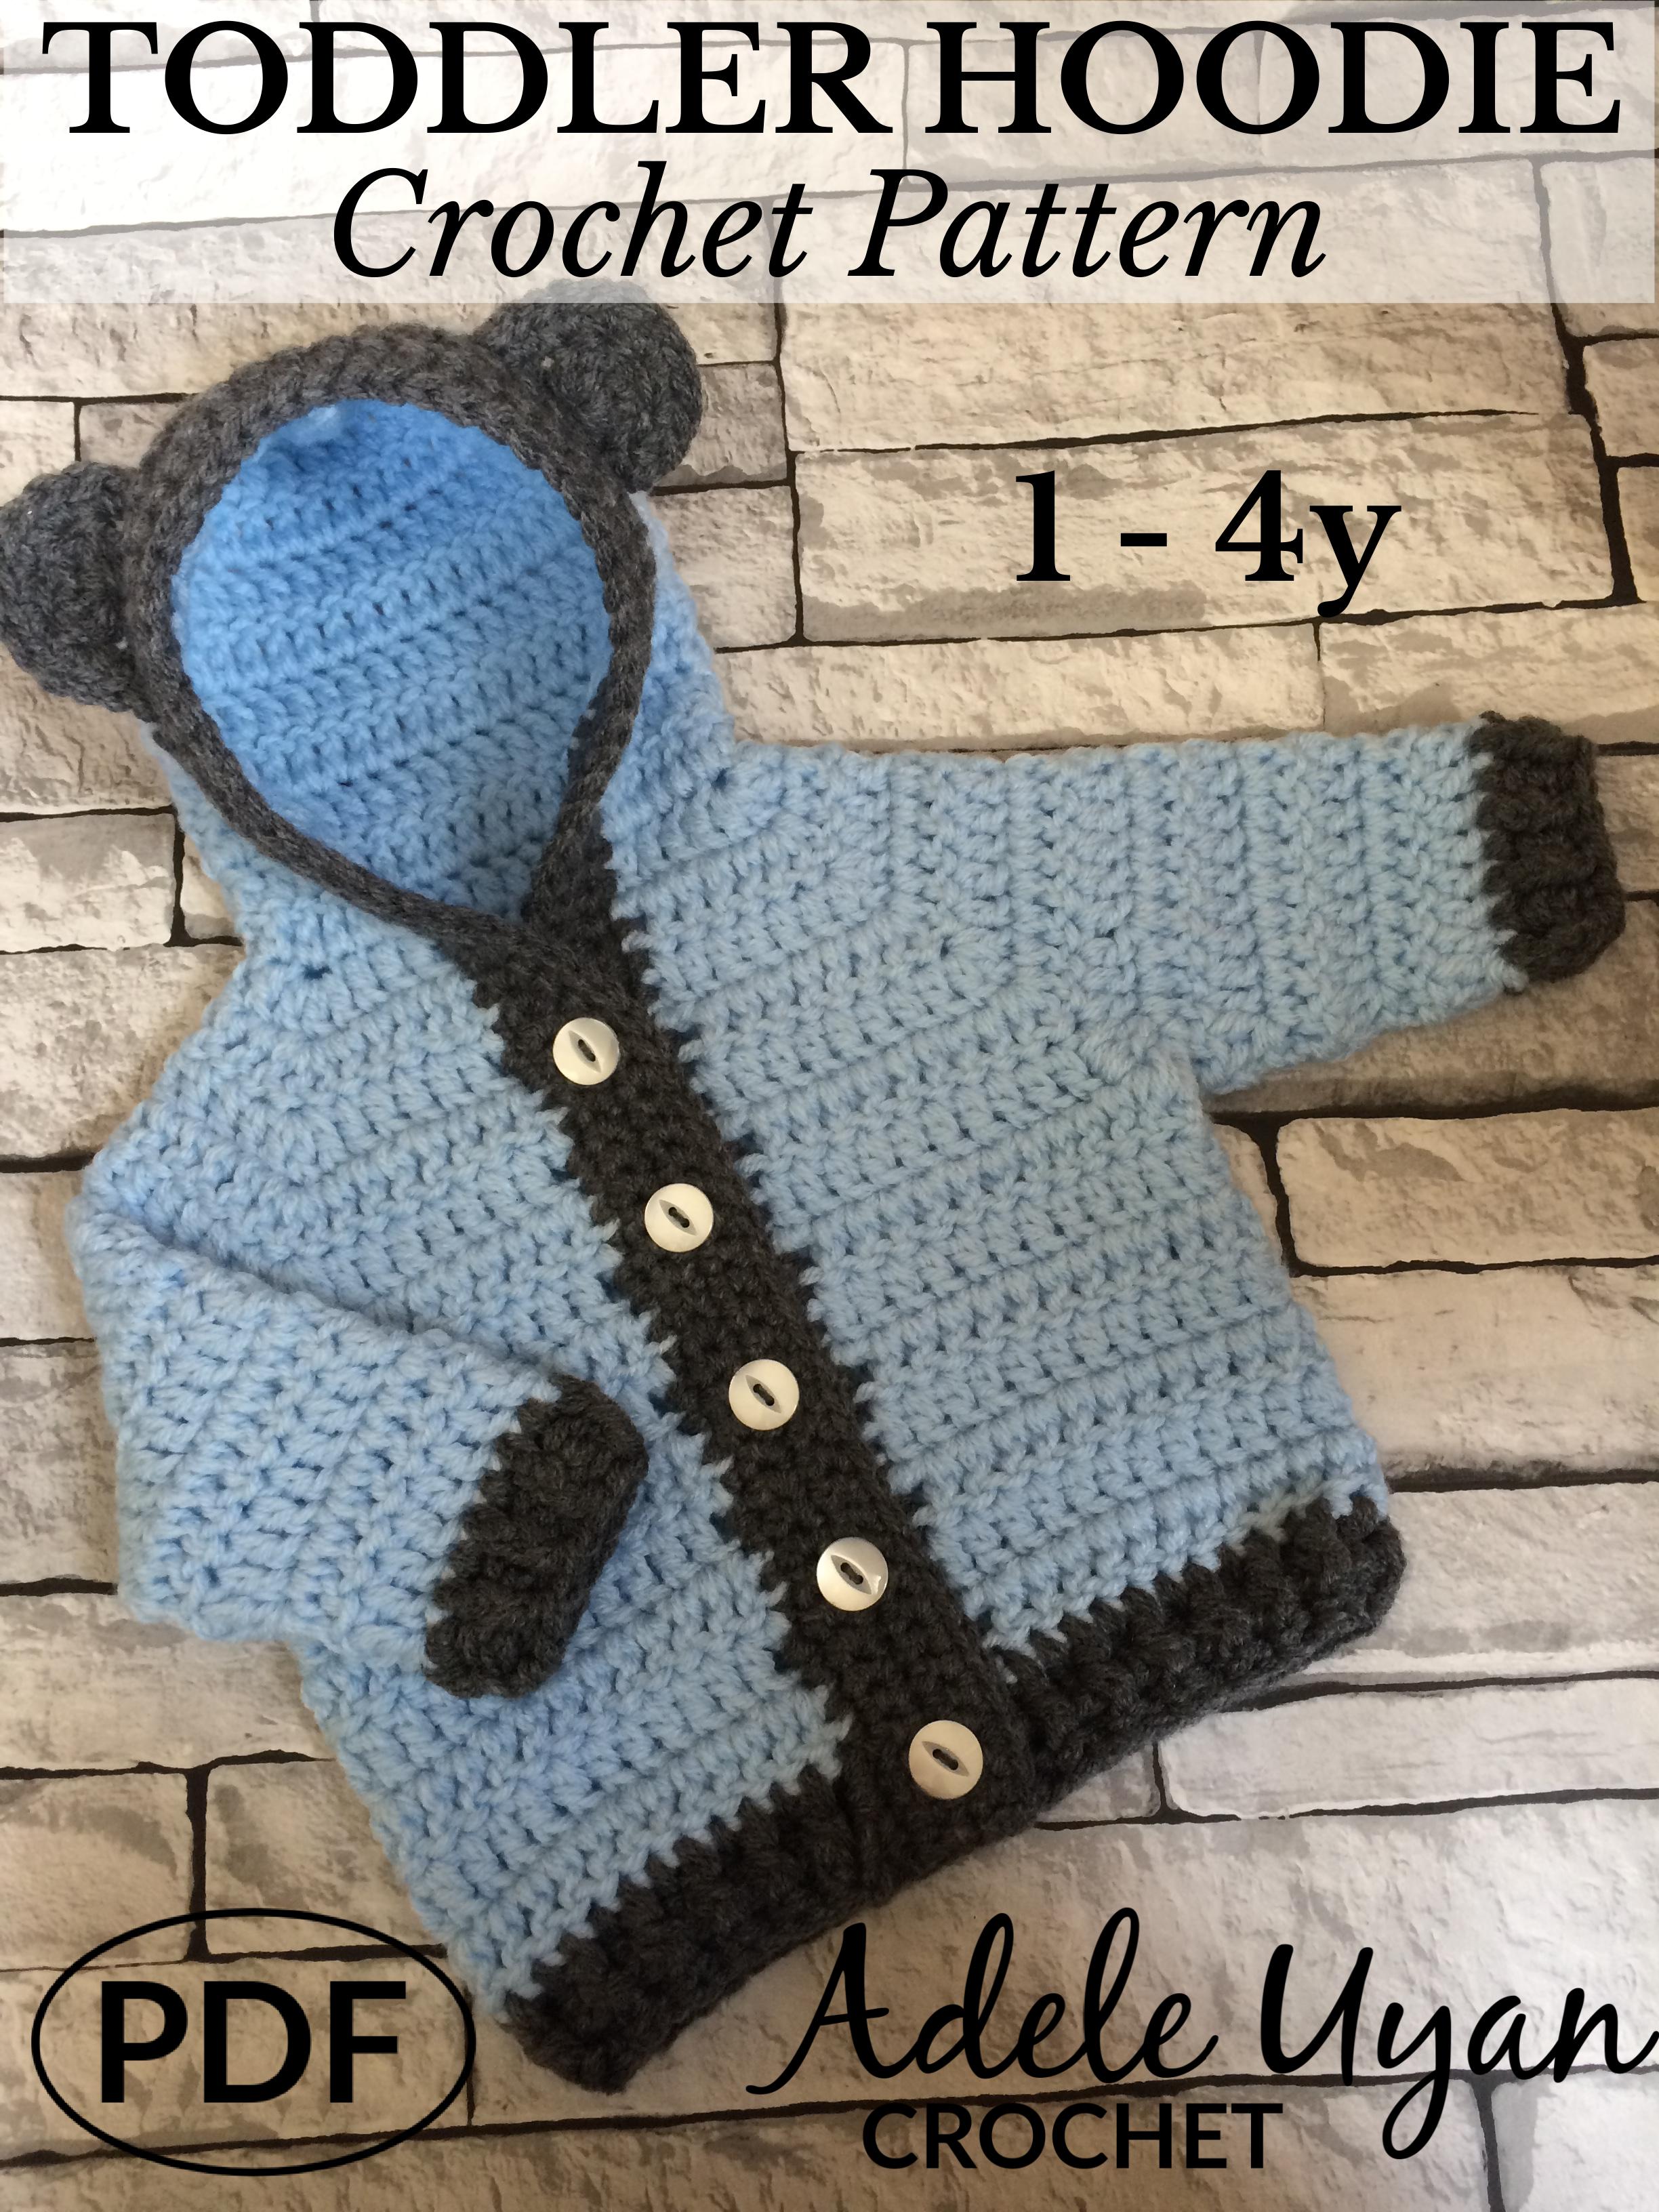 Toddler Hoodie Crochet Pattern Adele Uyan Crochet